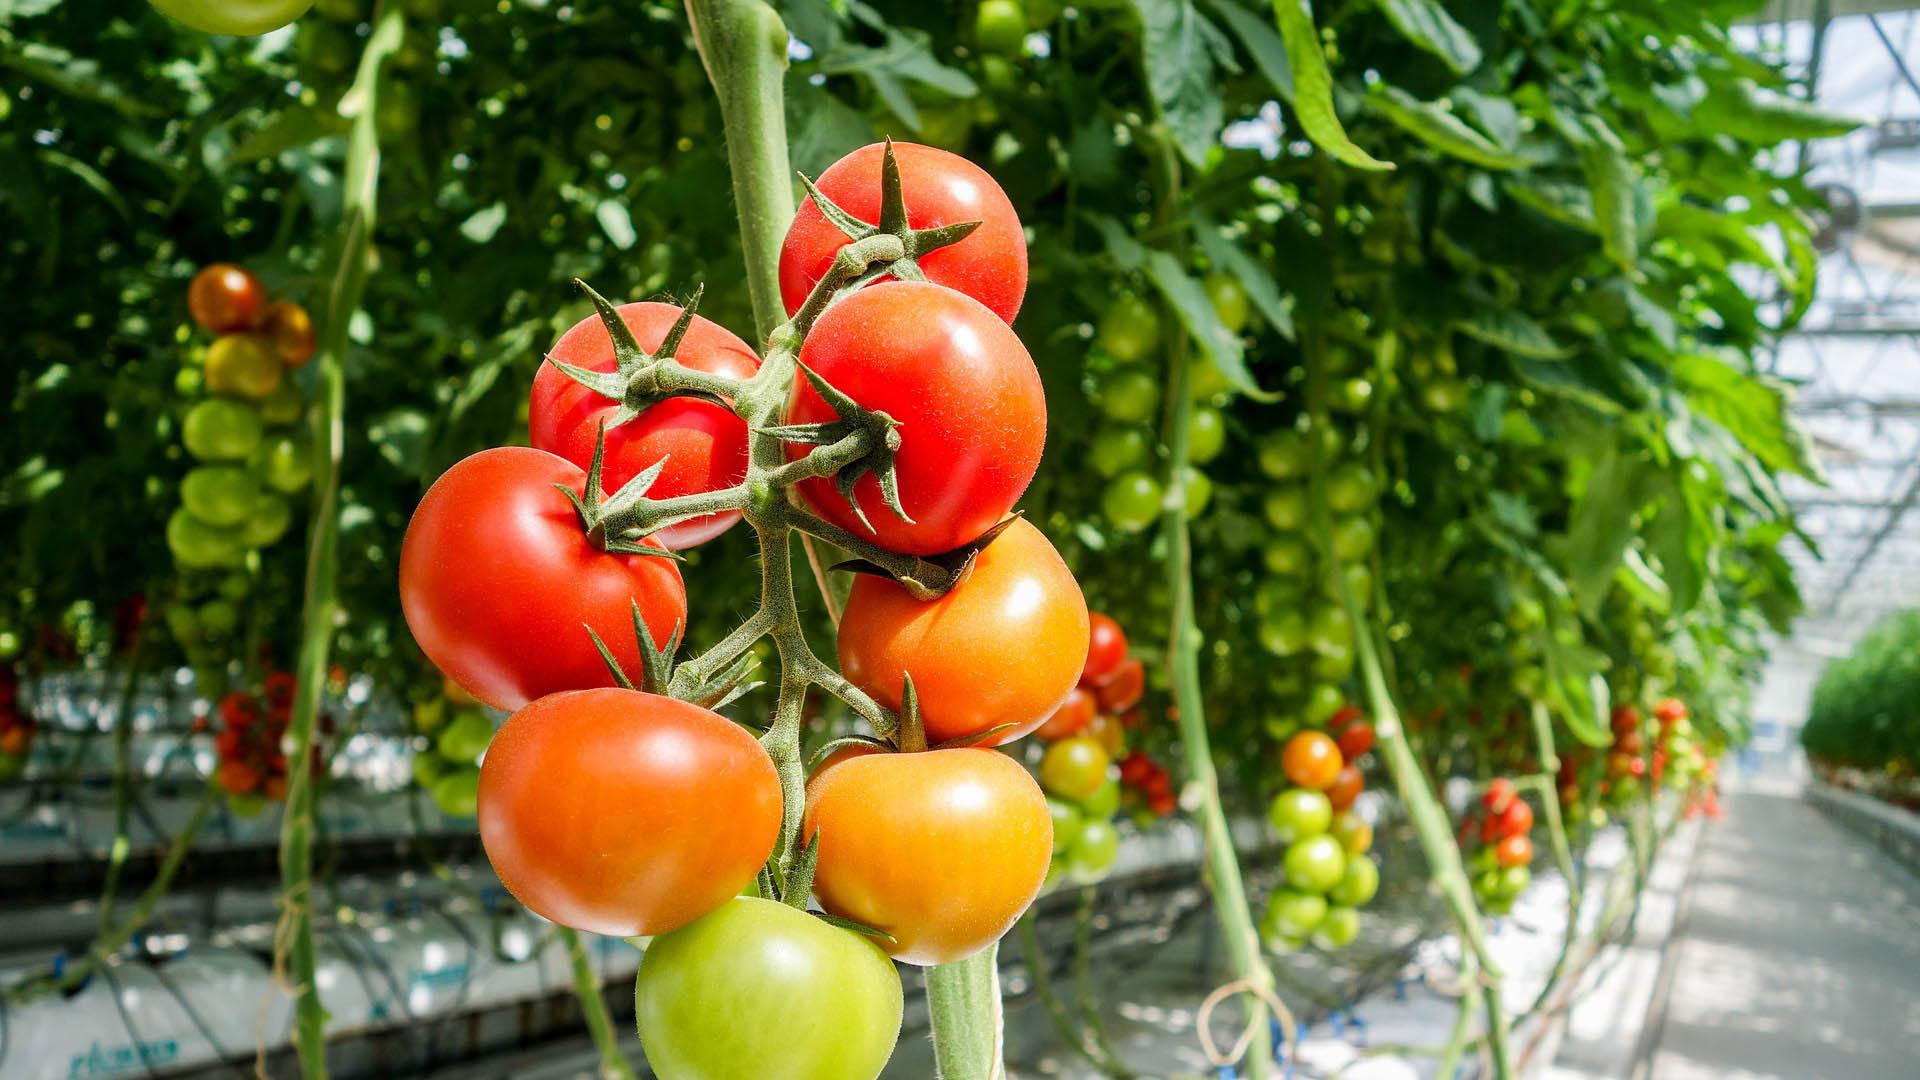 tomato-1310961_1920_web